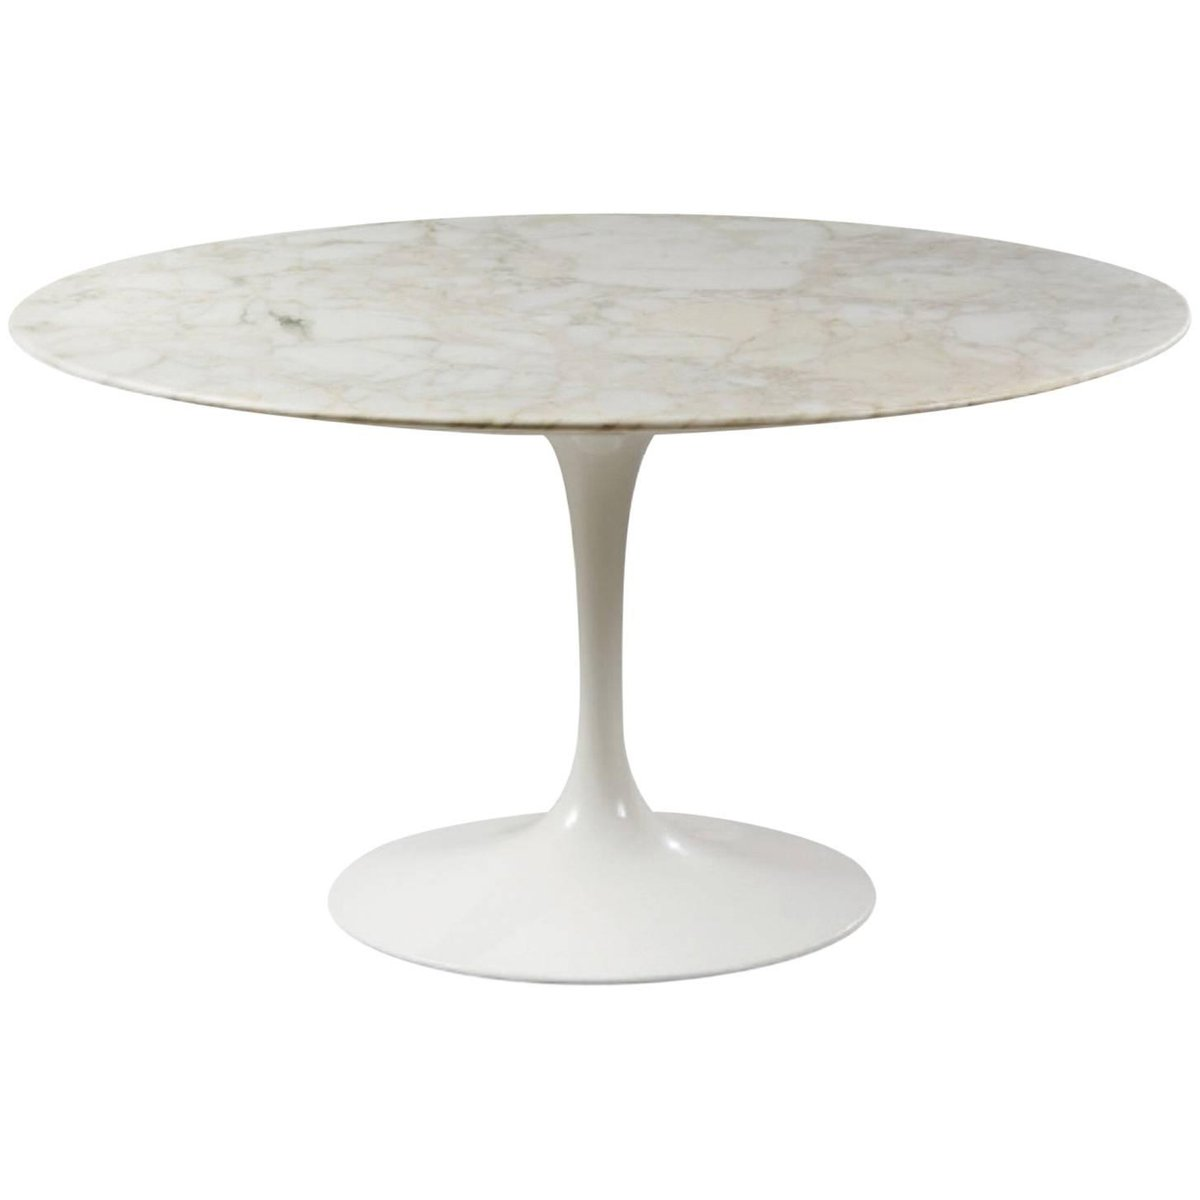 Vintage Tulip Coffee Table By Eero Saarinen For Knoll For